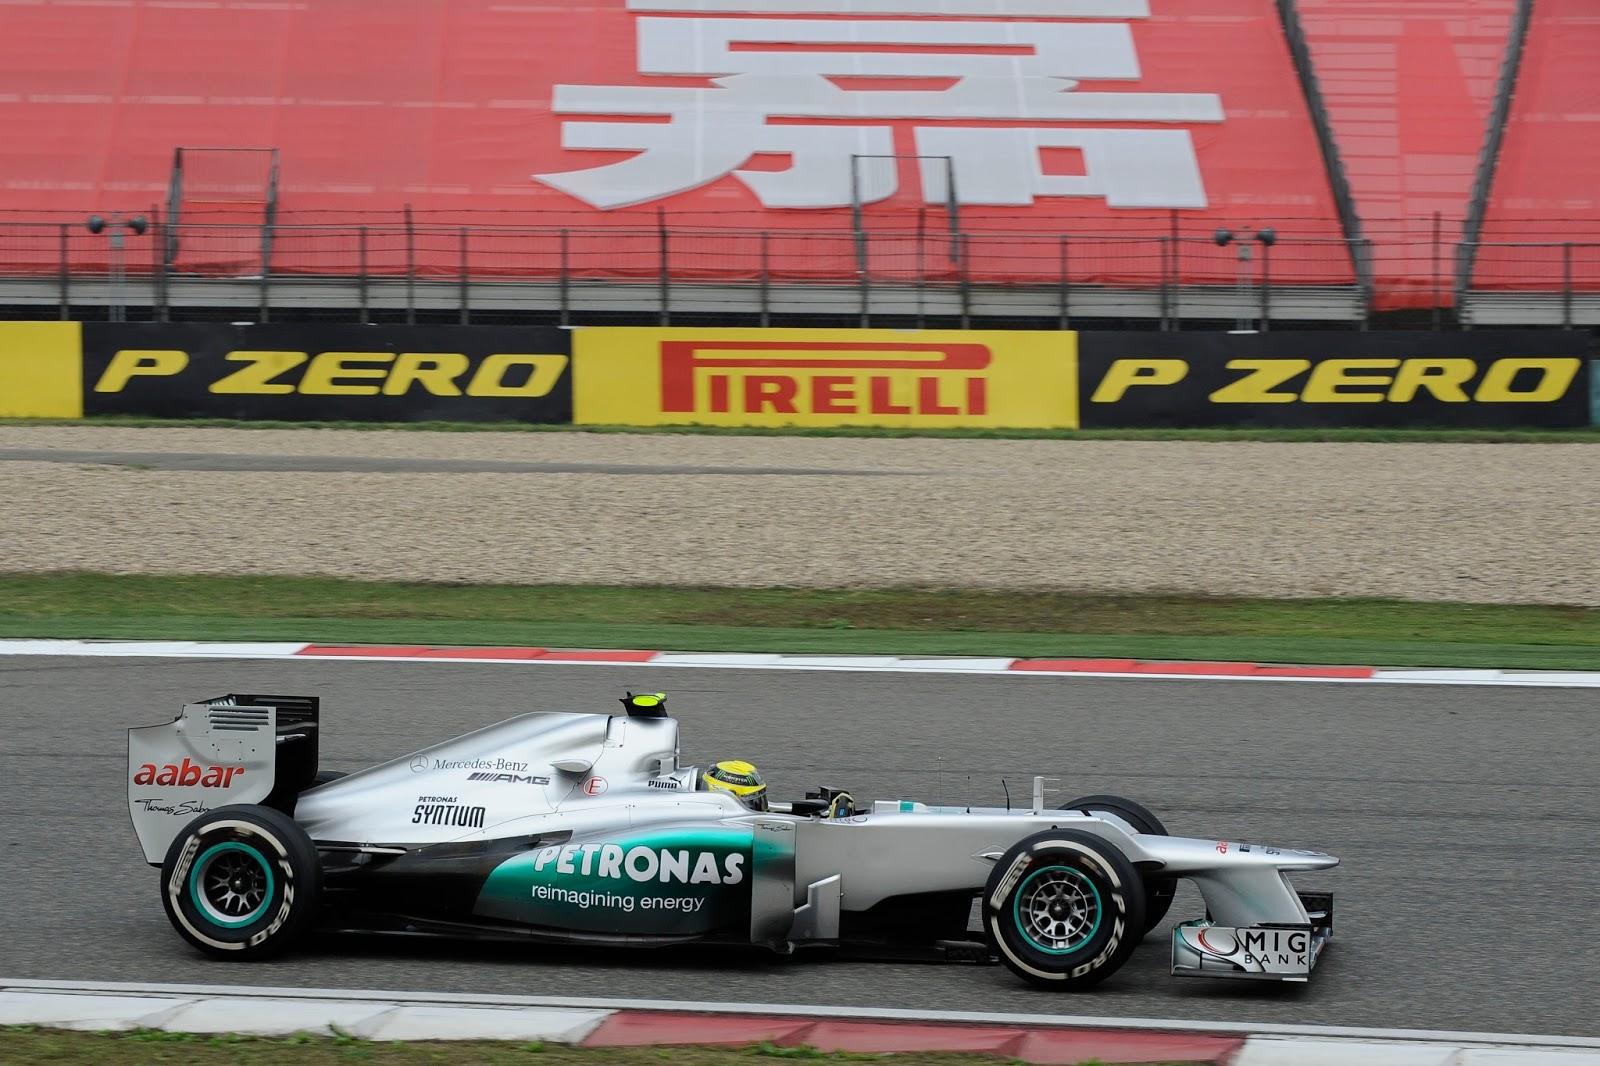 http://3.bp.blogspot.com/-wkq9tsk4KYM/UWKmSTFq_8I/AAAAAAAABAs/2YsJUyJ6o_U/s1600/2012-Chinese-Grand-Prix-Race-Winner-Nico-Rosberg.jpg